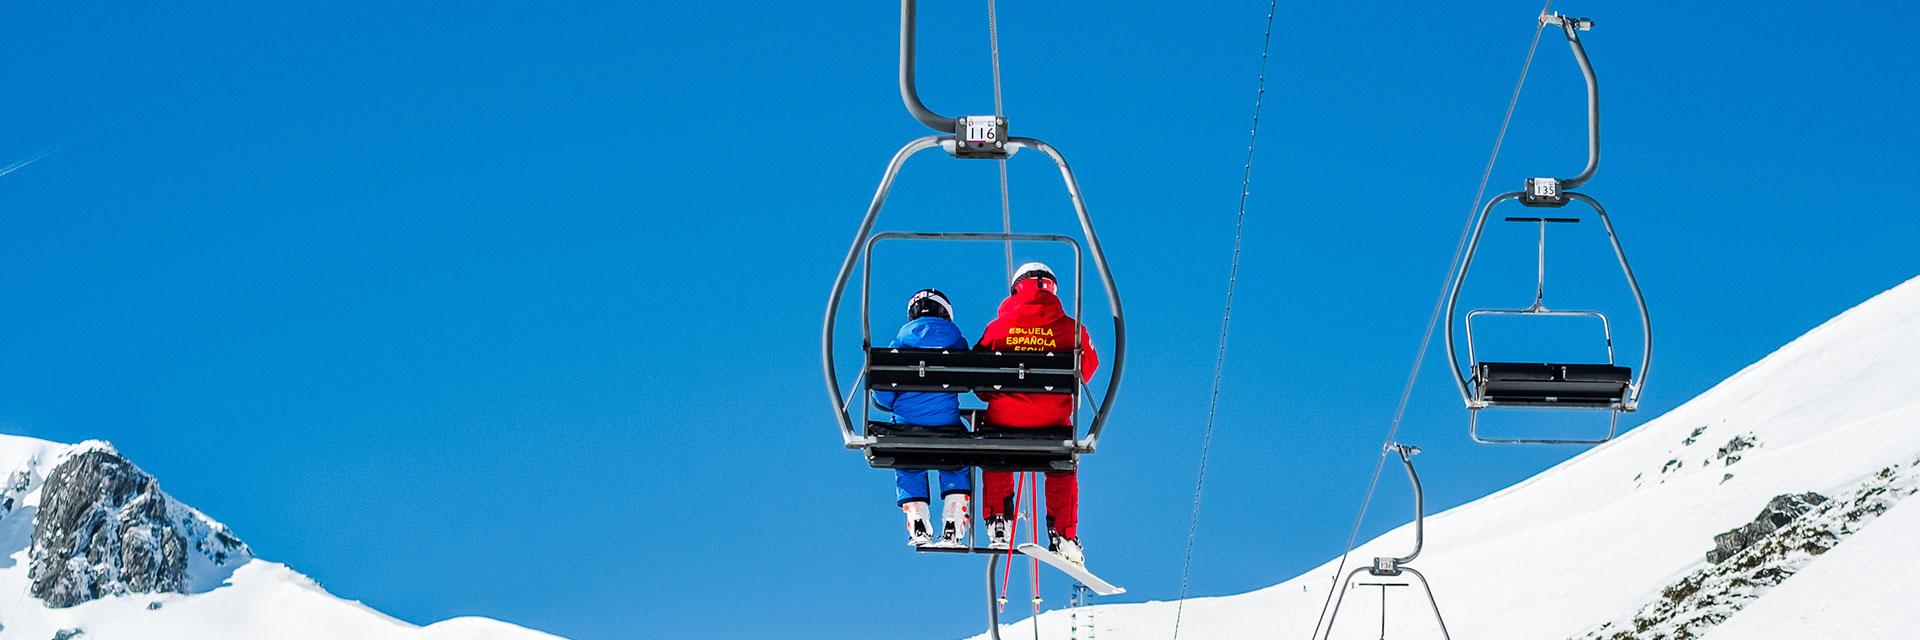 SnowboardEscuelaSanIsidroPortAlquiler